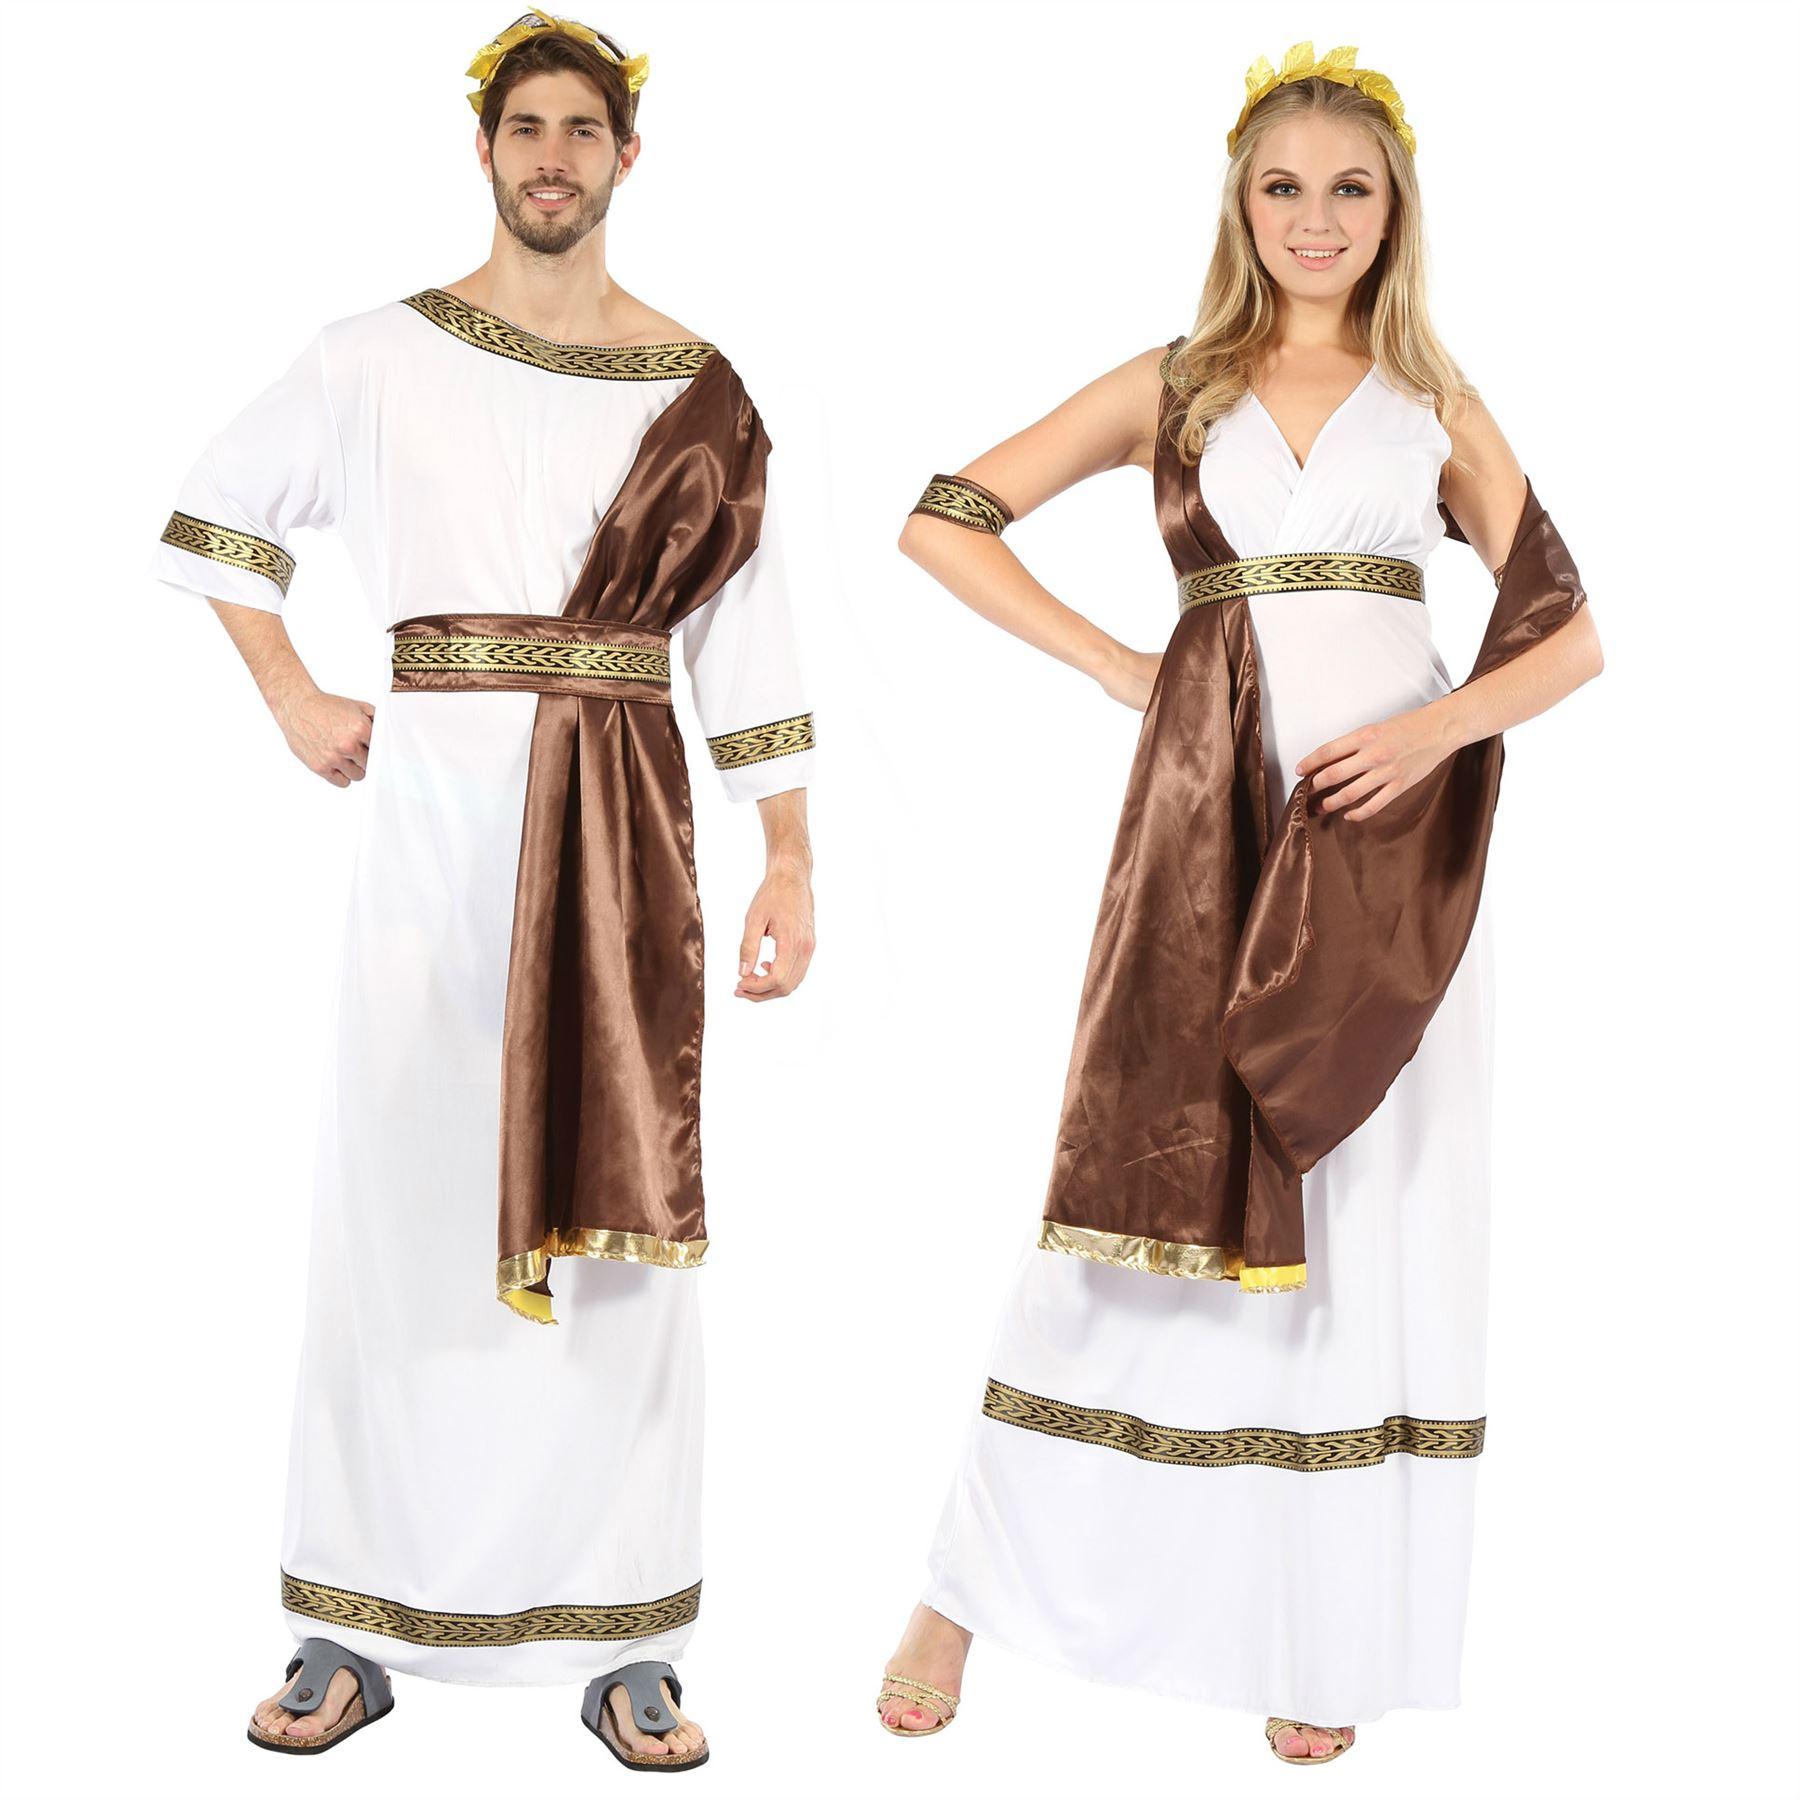 Adults-Toga-Costume-Mens-Greek-Roman-Fancy-Dress-  sc 1 st  eBay & Adults Toga Costume Mens Greek Roman Fancy Dress Ladies Grecian ...